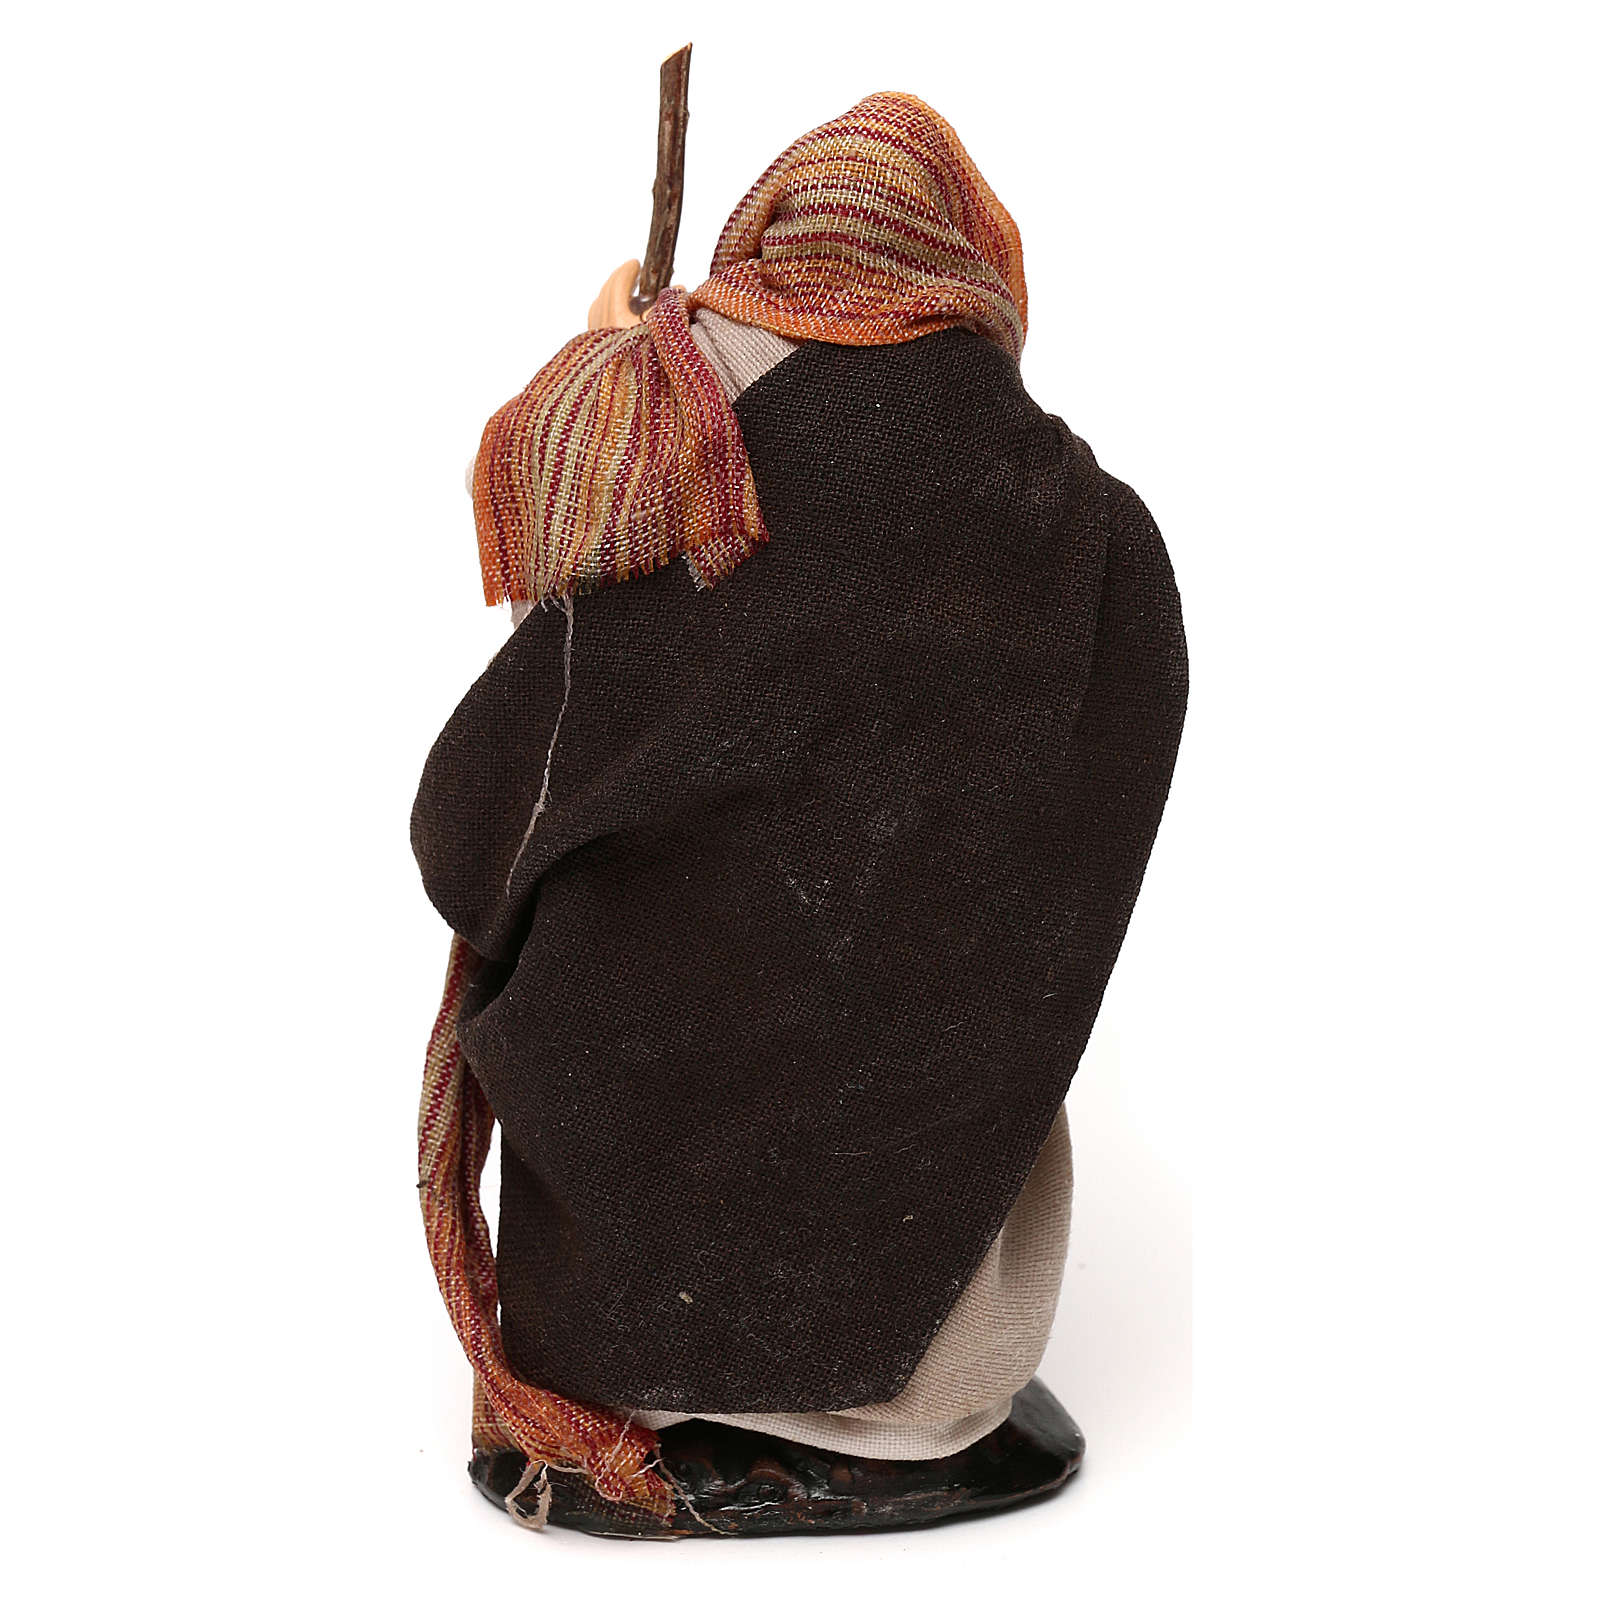 San Giuseppe presepe napoletano 12 cm 4